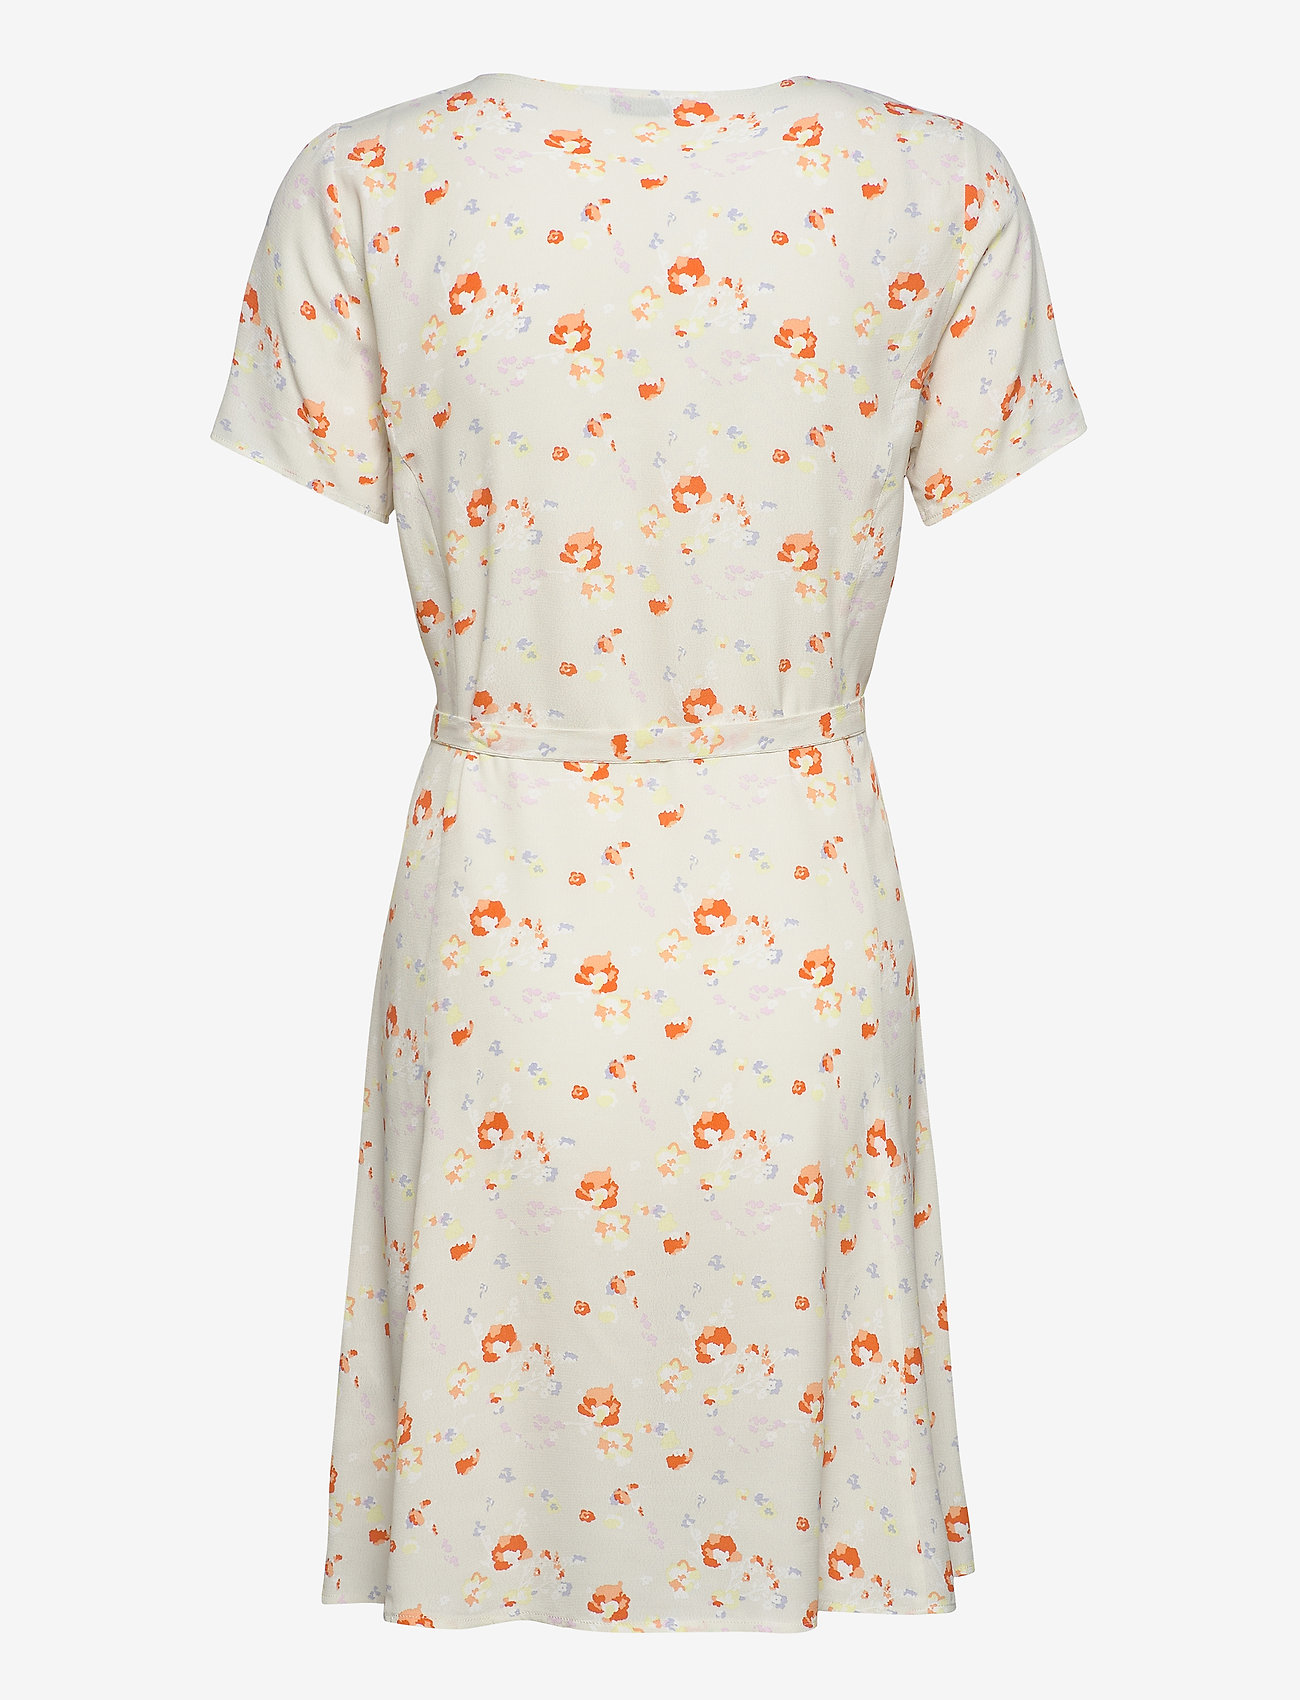 Enfairfax Ss Dress Aop 6696 (Ballerina Fleur) (39 €) - Envii cdxxo